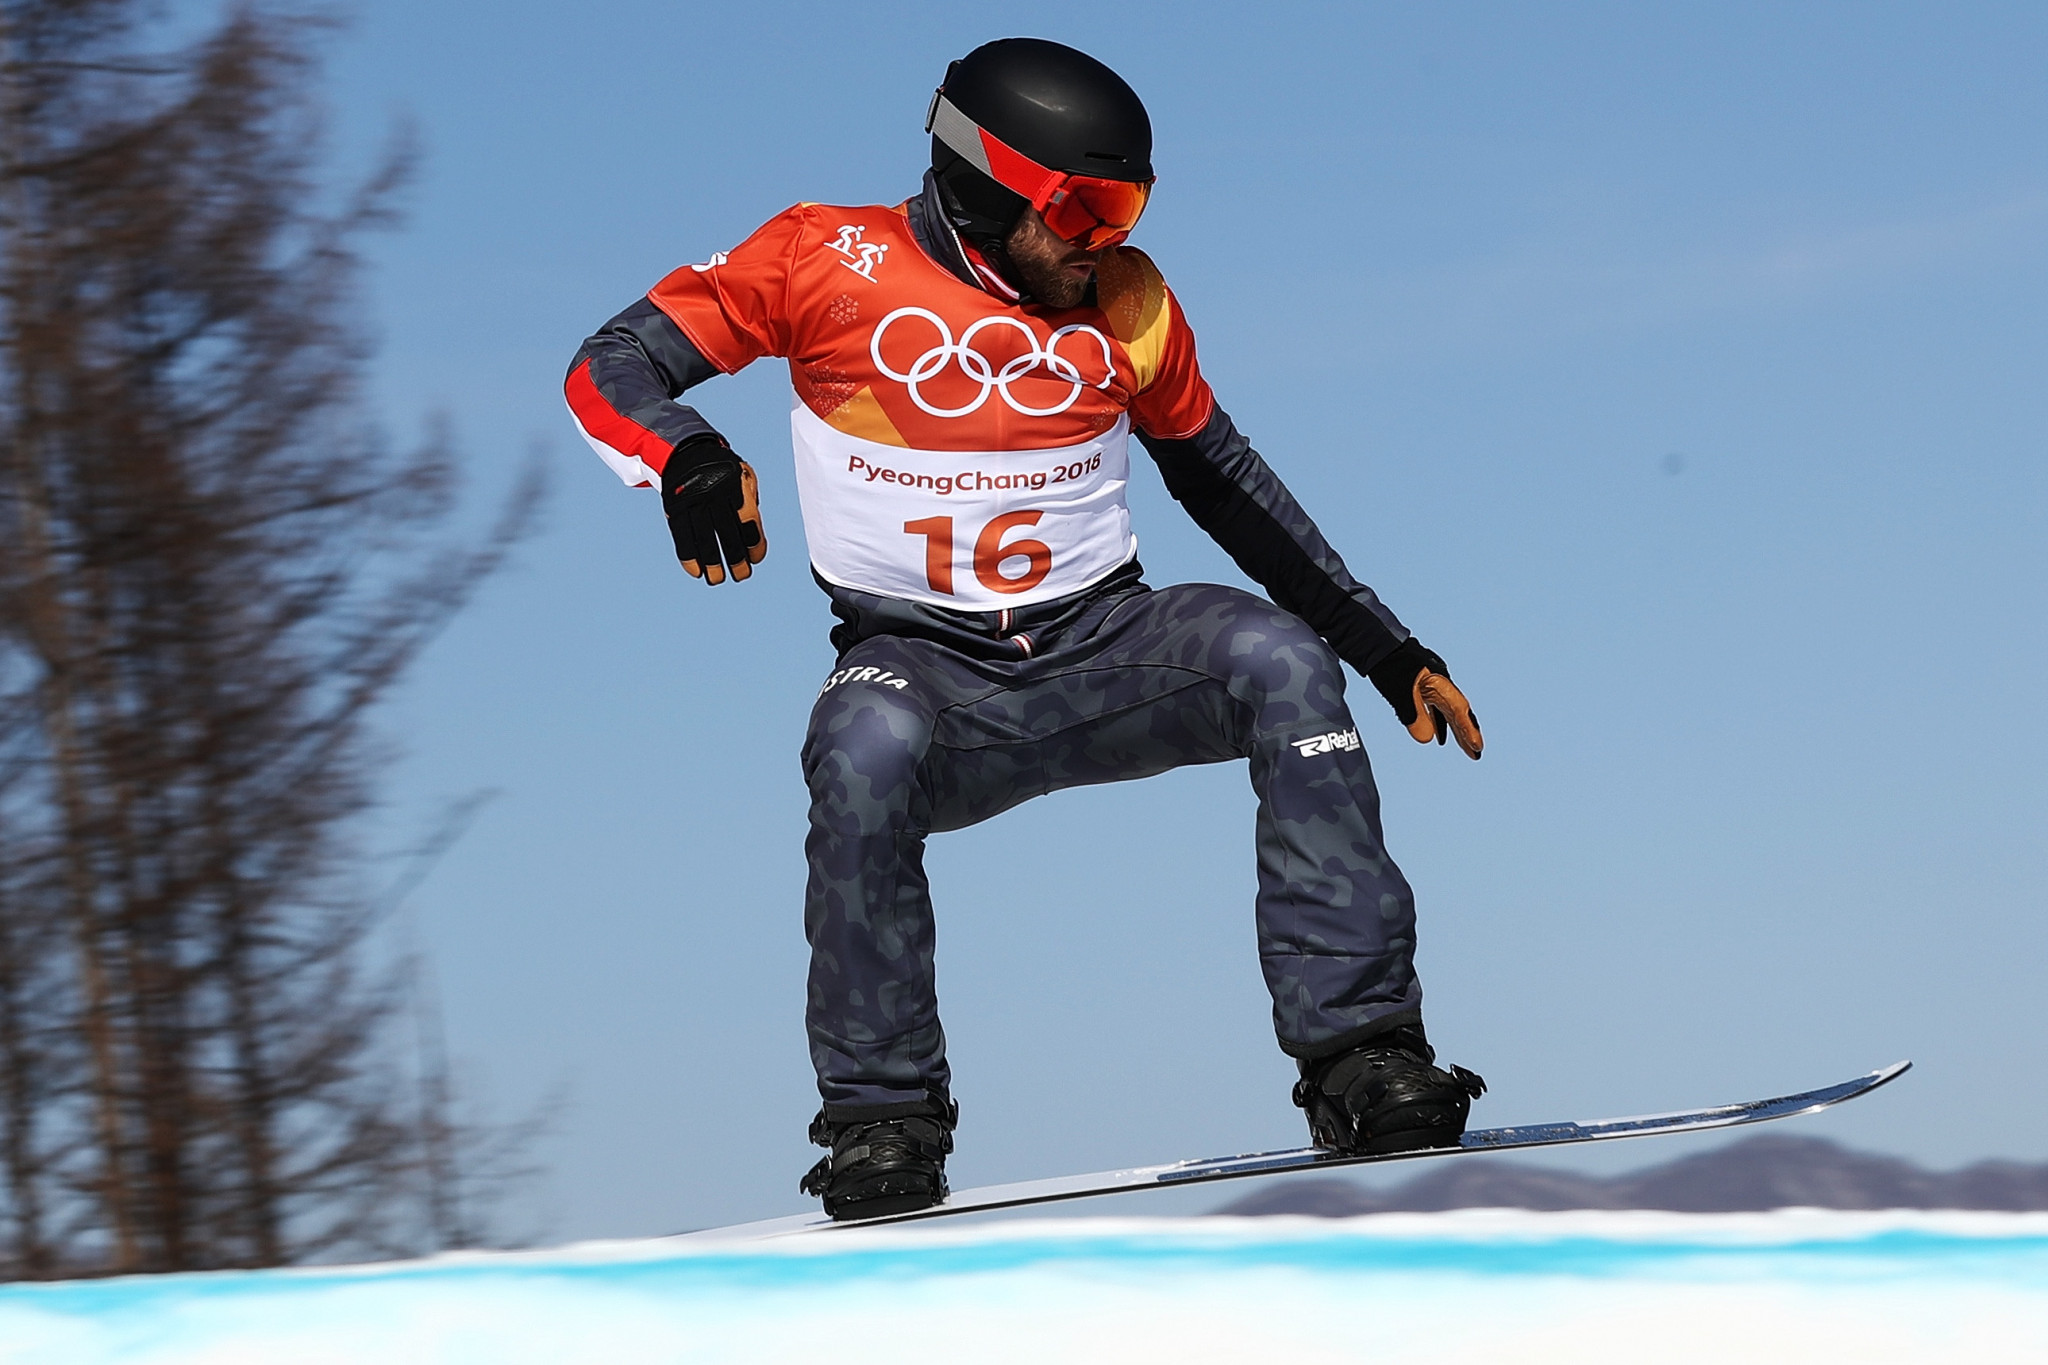 Schairer retires from snowboard cross after broken neck at Pyeongchang 2018